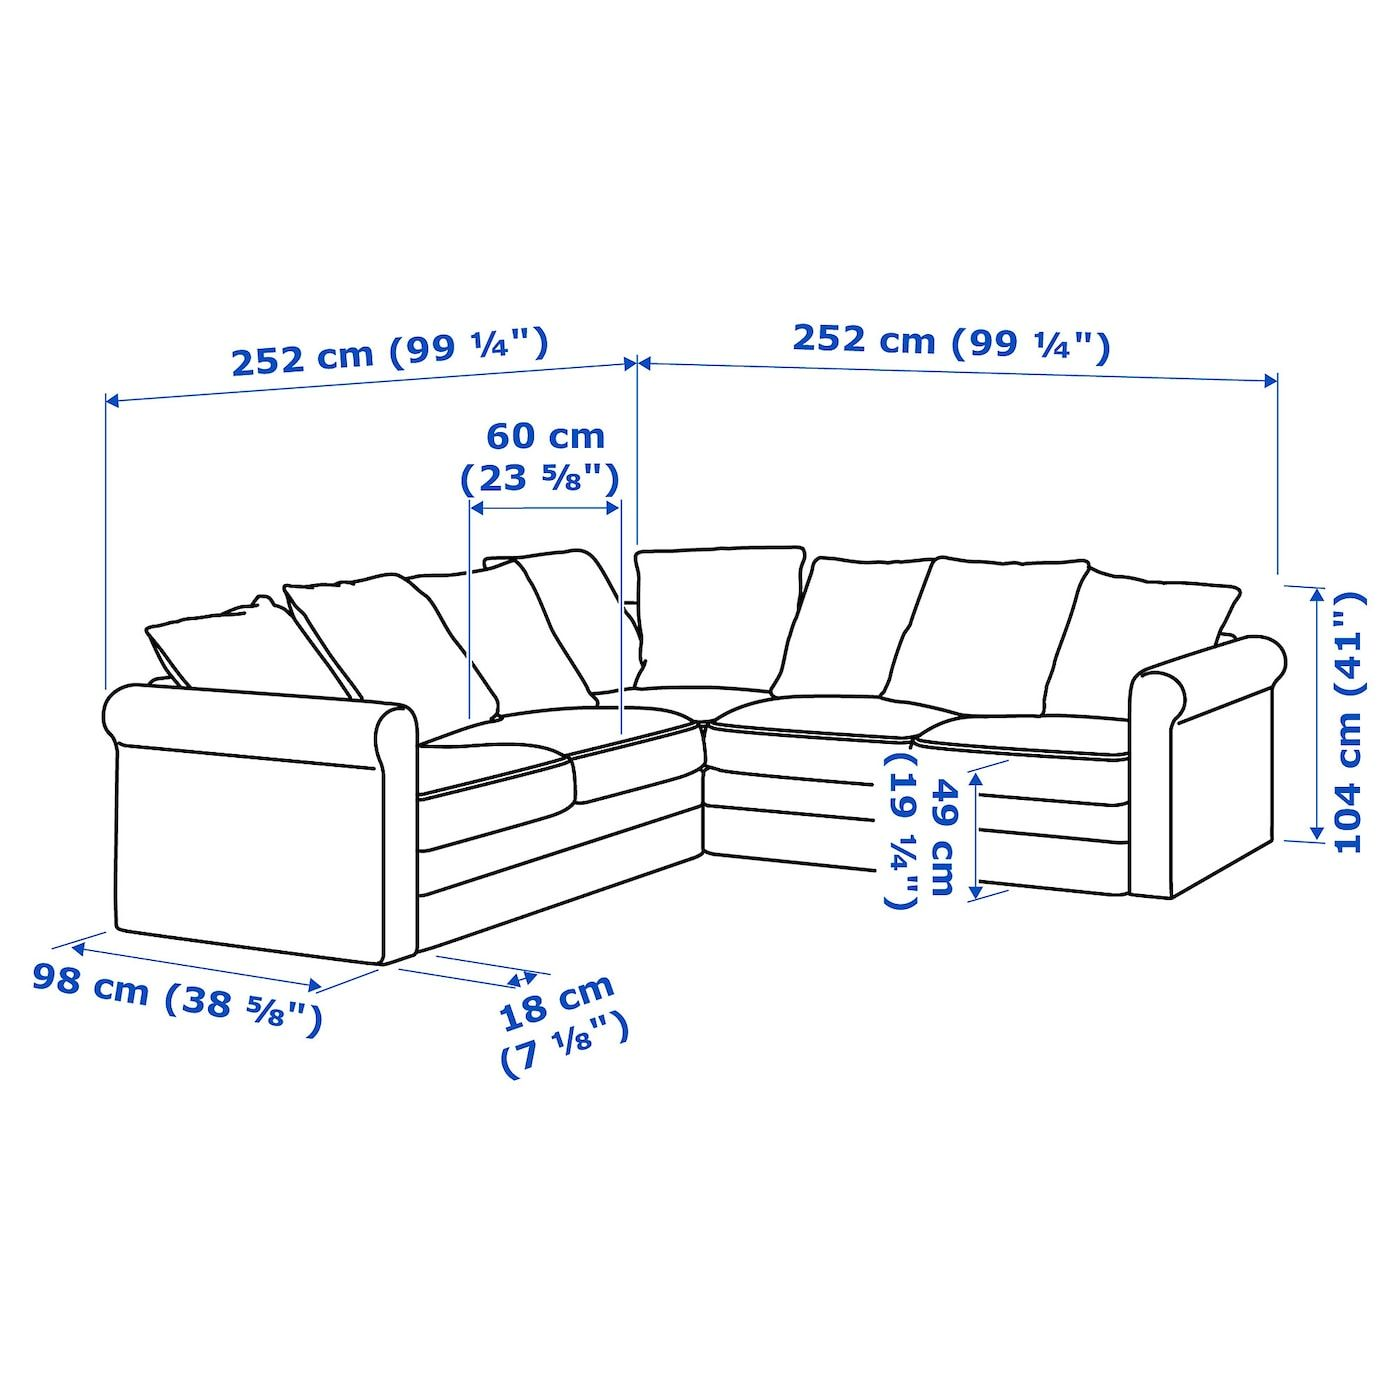 Ikea Gr Ouml Nlid Ecksofa 4 Sitzig Ljungen Hellgr Uuml N In 2020 Ecksofa Ikea Sofa